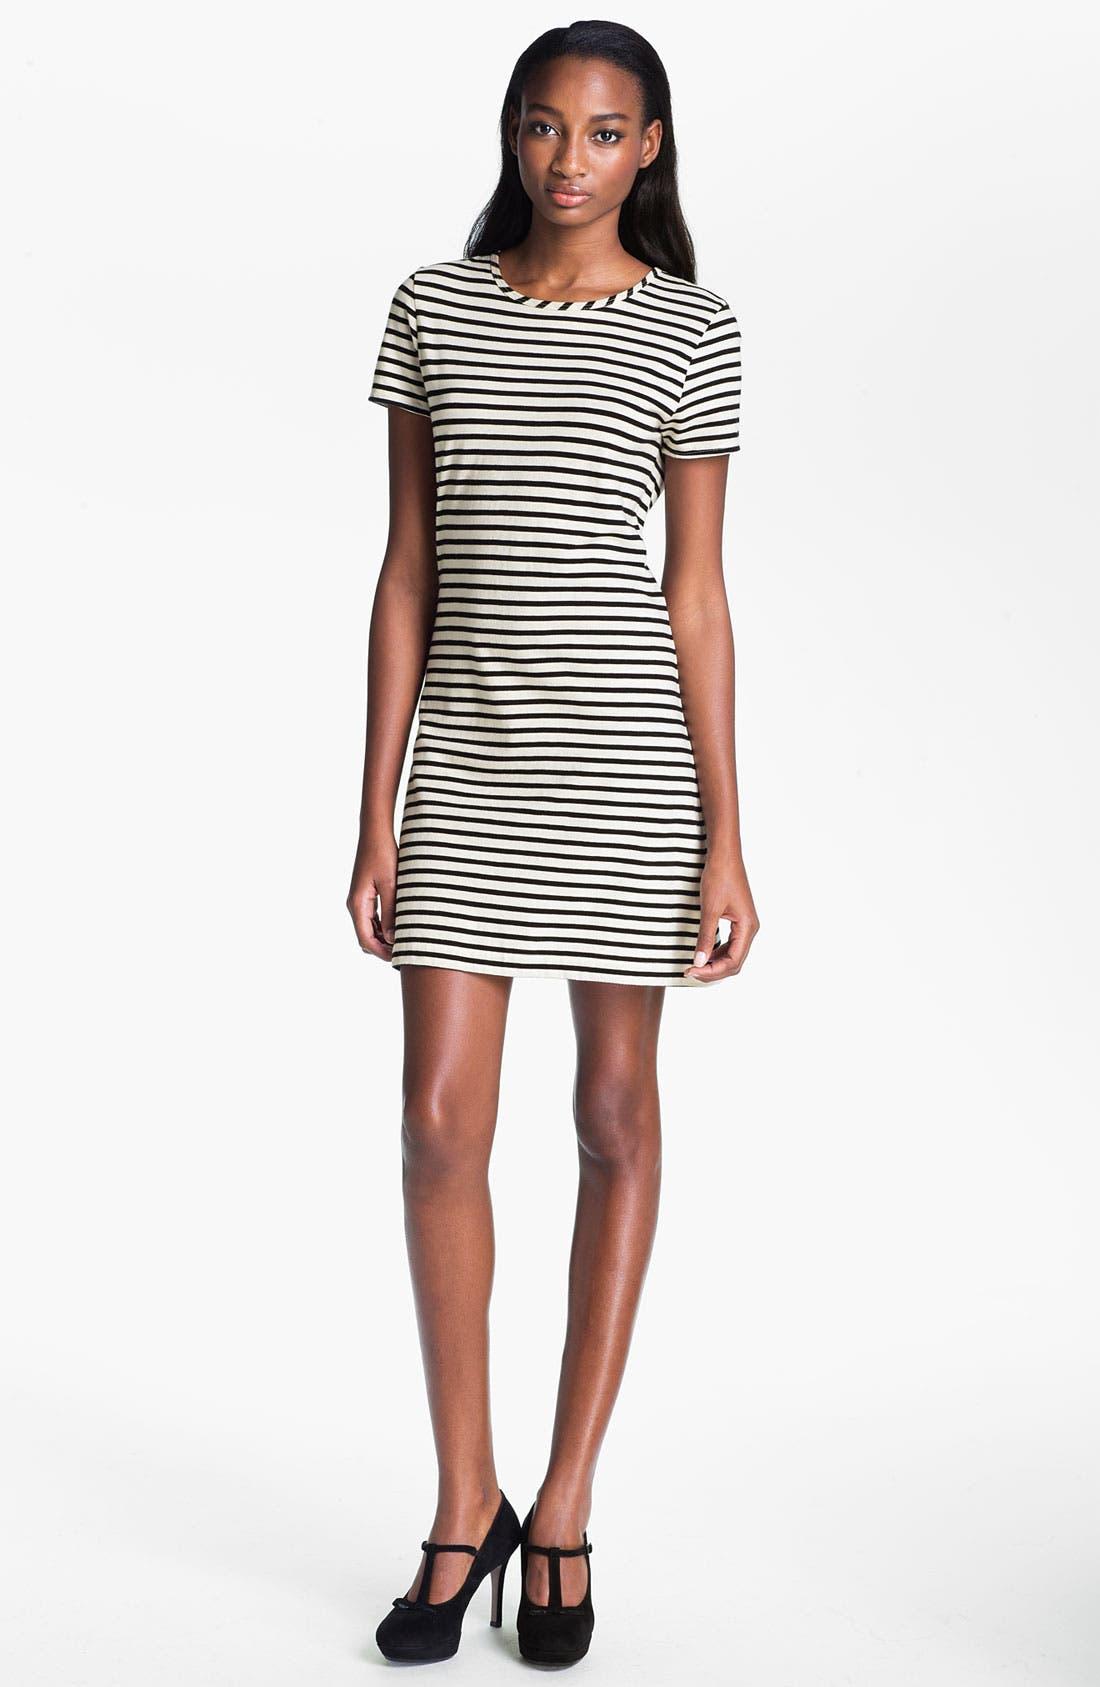 Main Image - Skaist-Taylor Stripe Cotton T-Shirt Dress